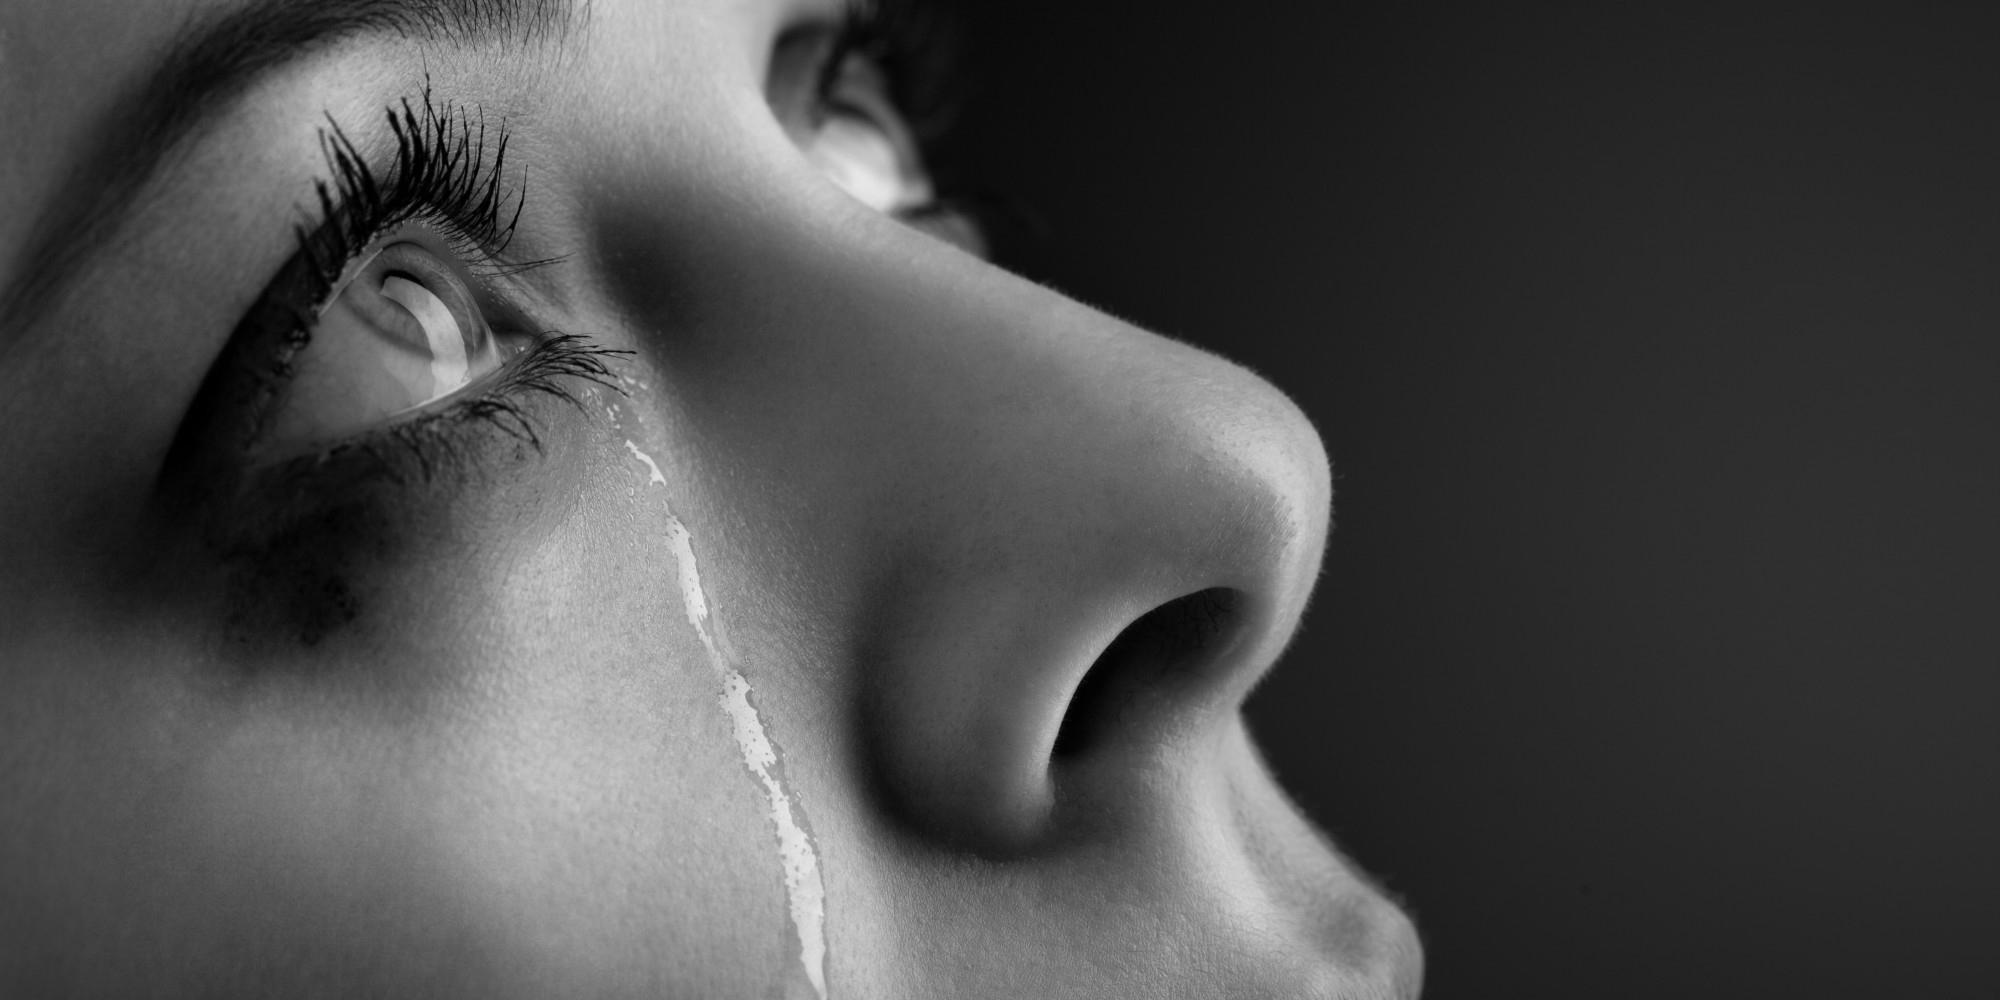 o-woman-crying-facebook.jpg